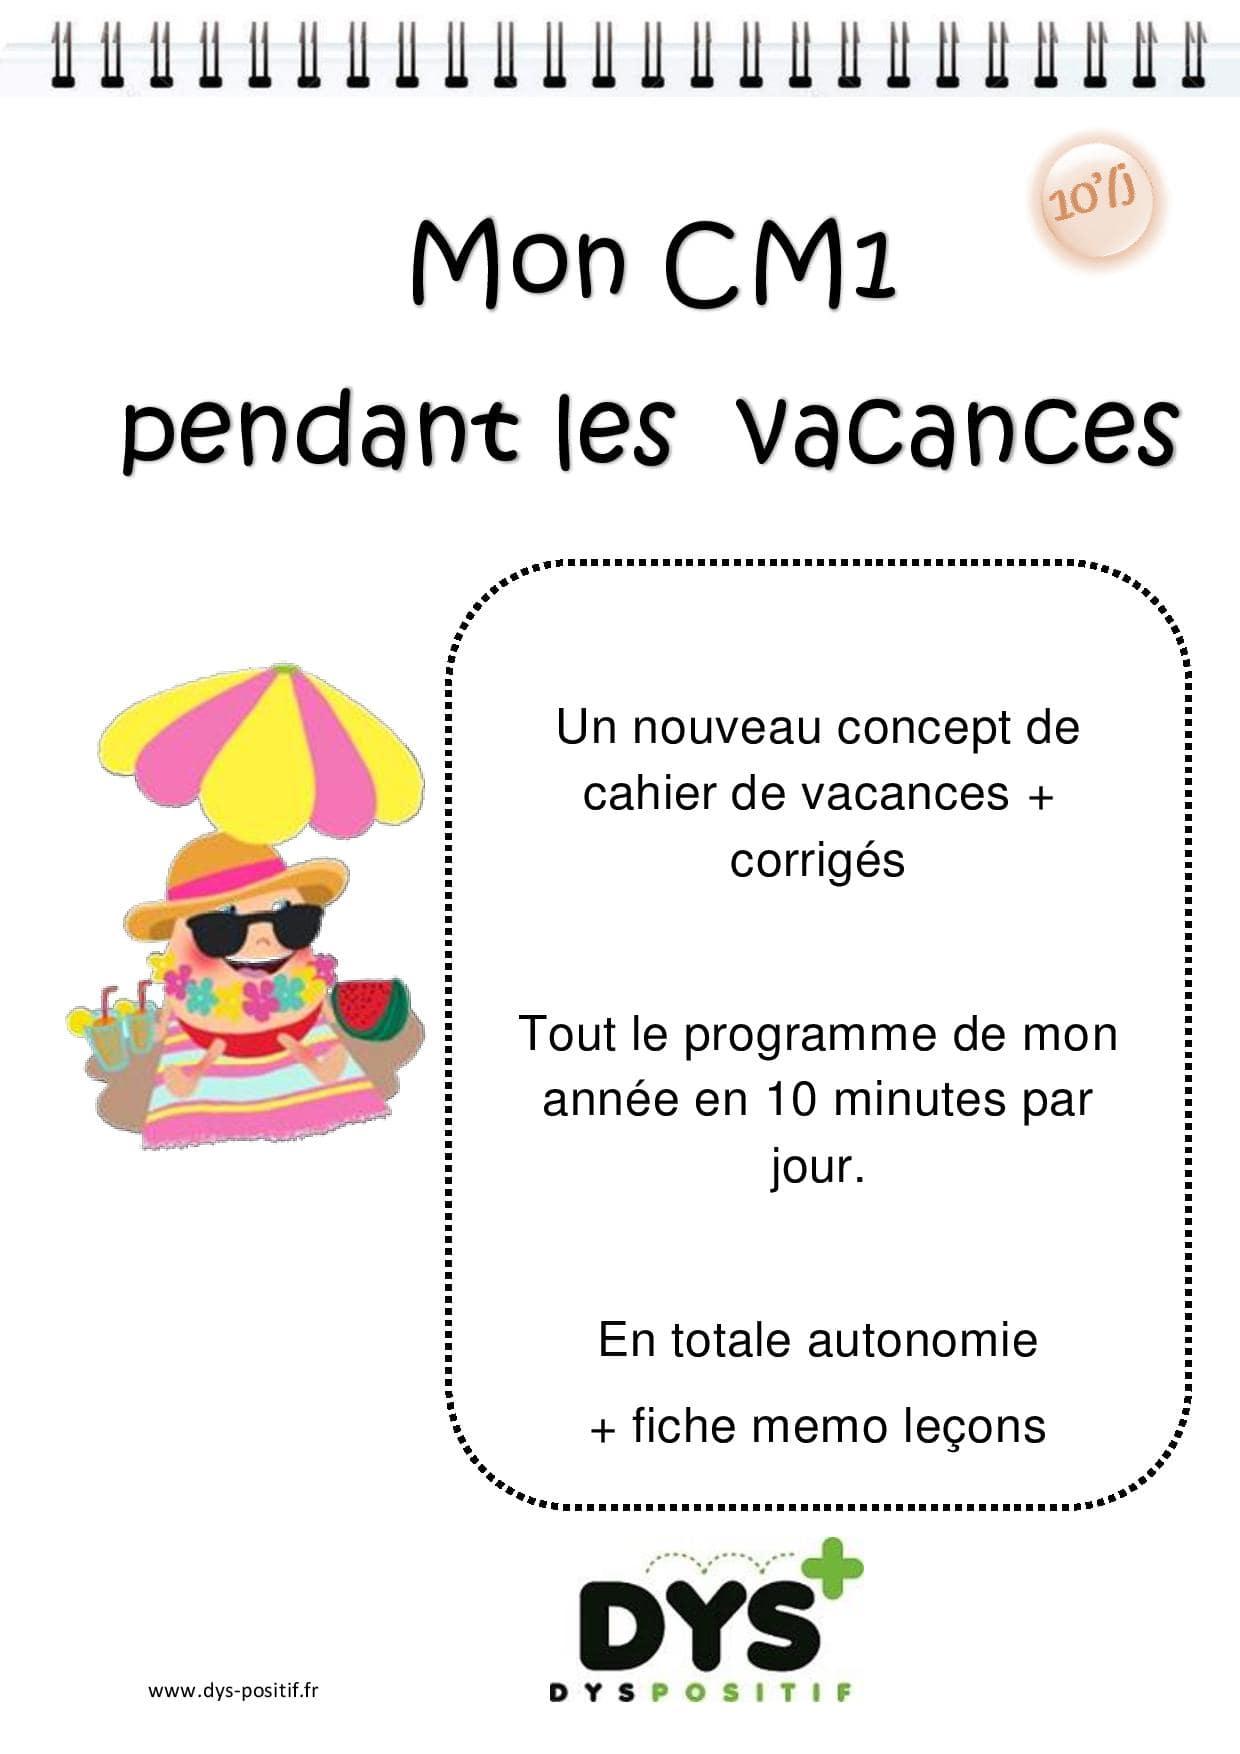 Cahier de vacances de Français au CM1